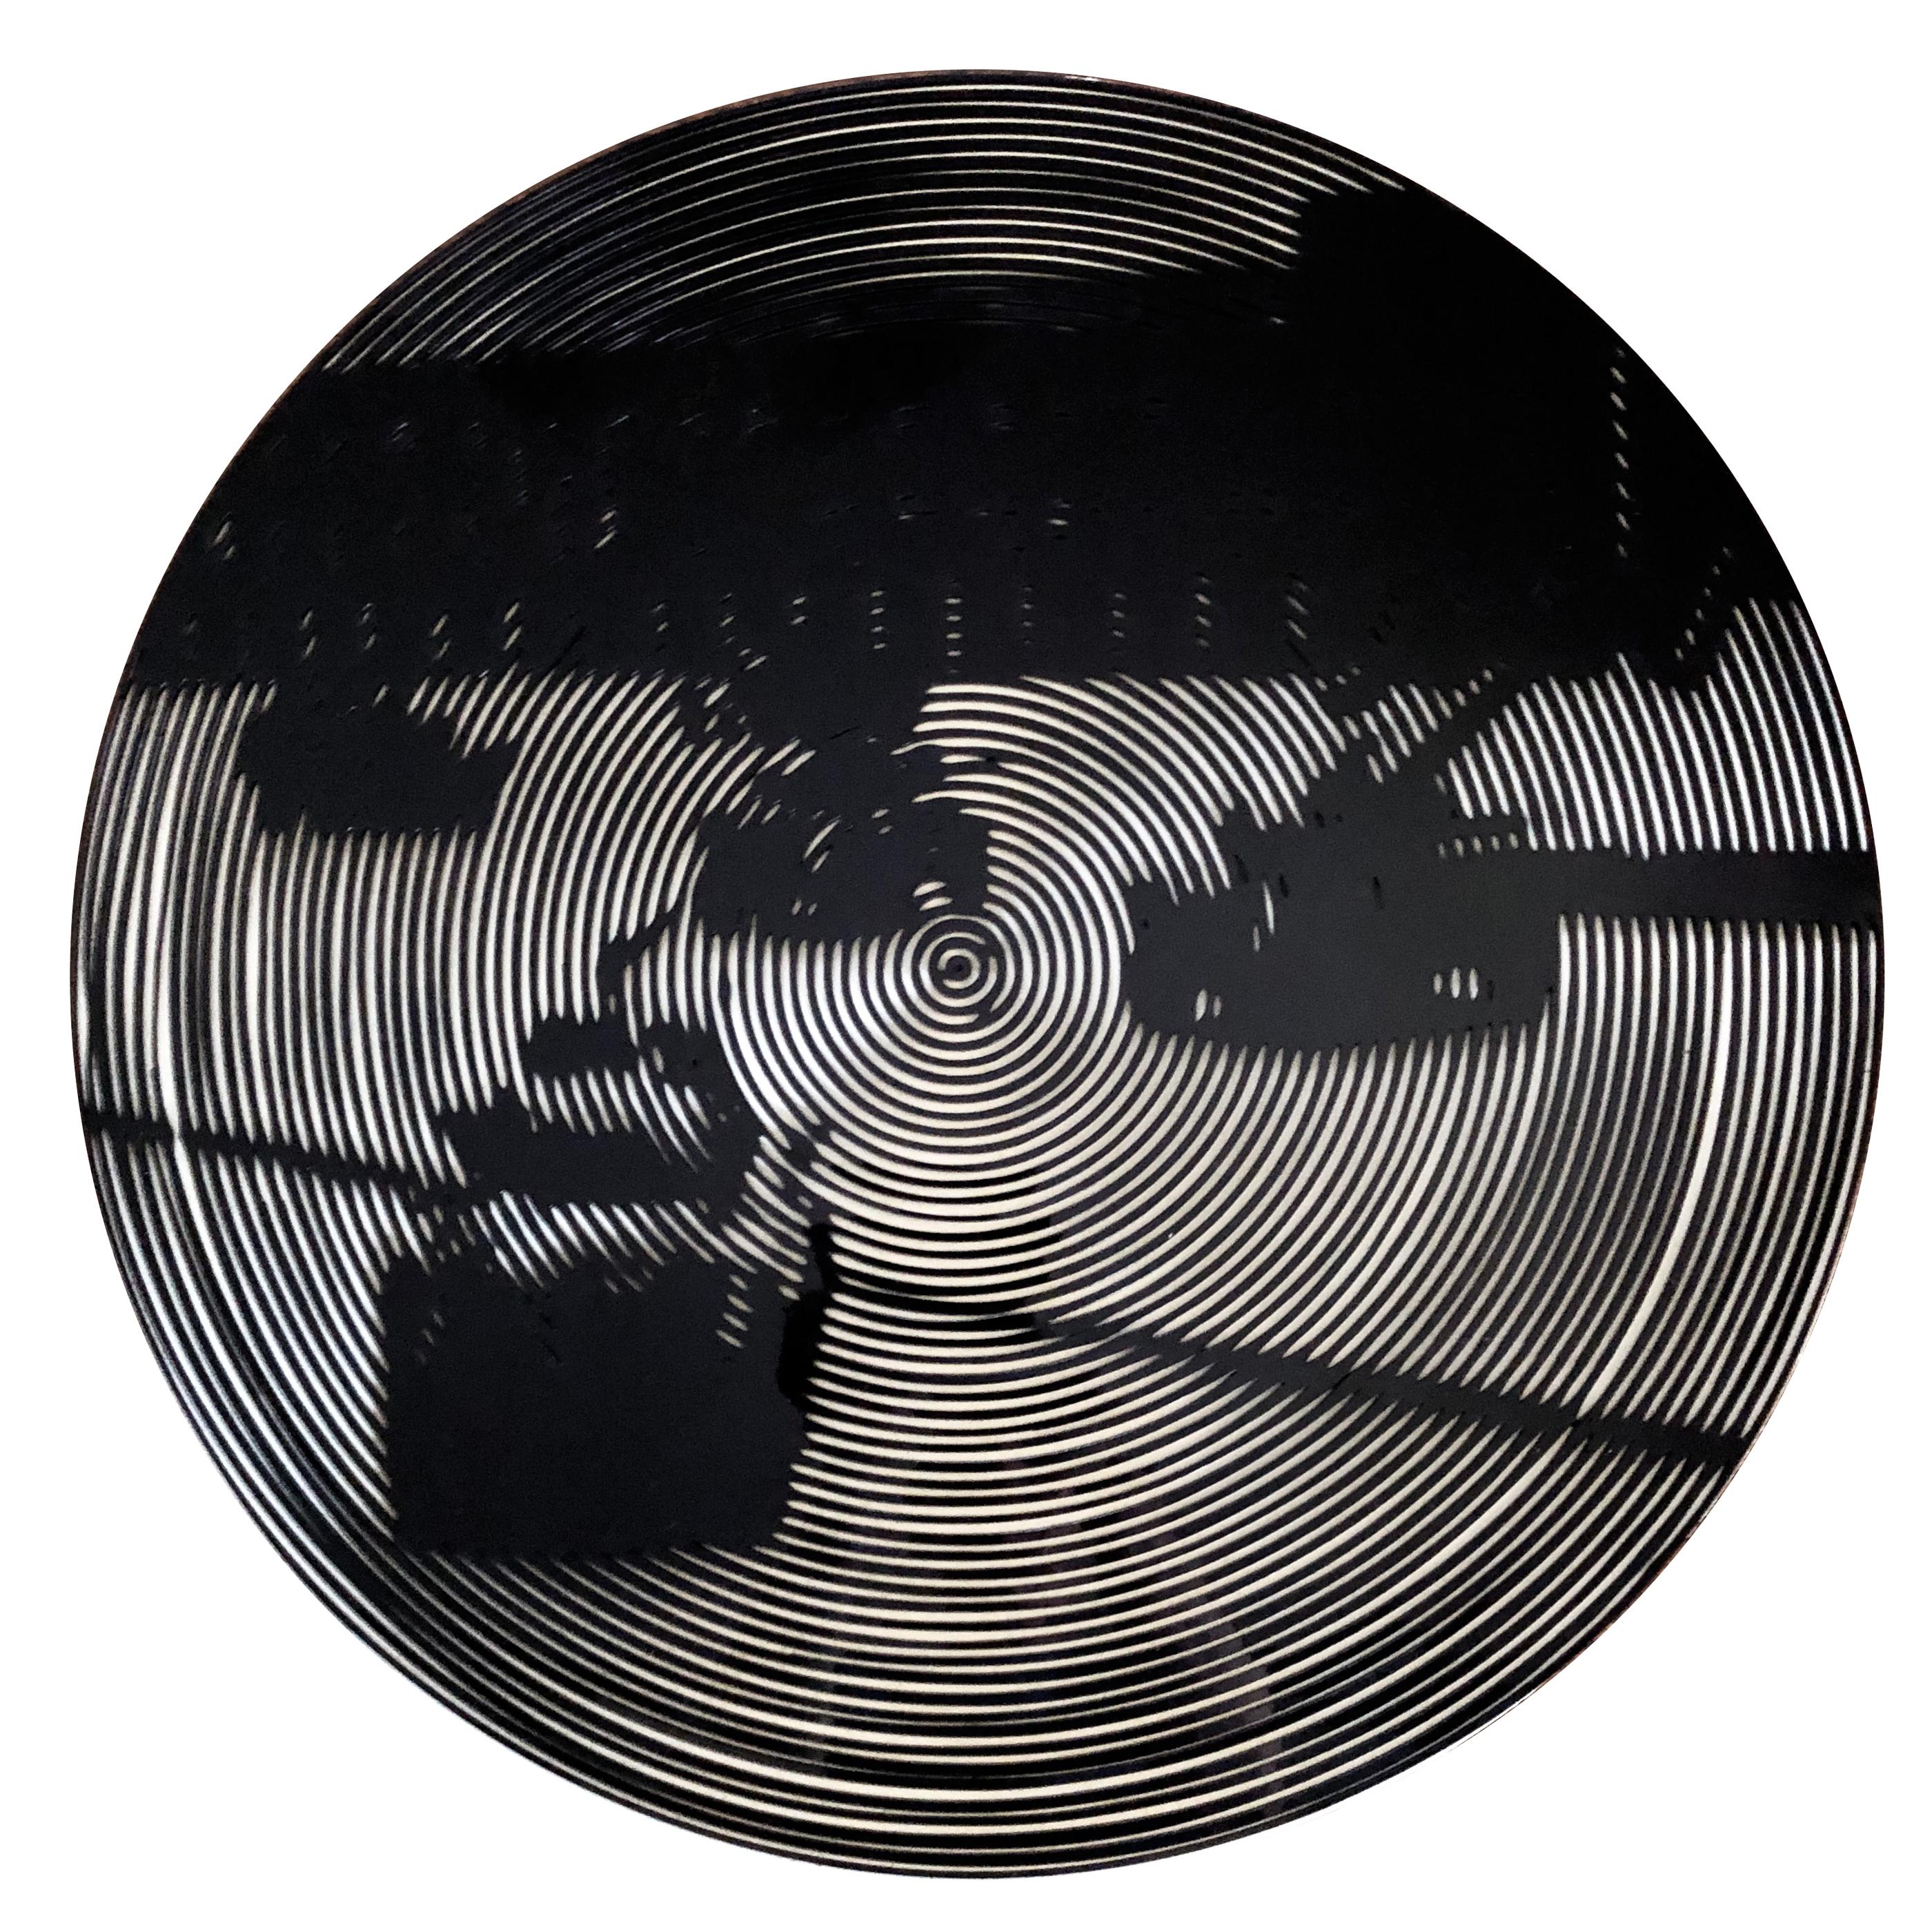 Nelson Gutierrez, Tanks, 2019, 24 inches in diameter, Plexiglass and MDF